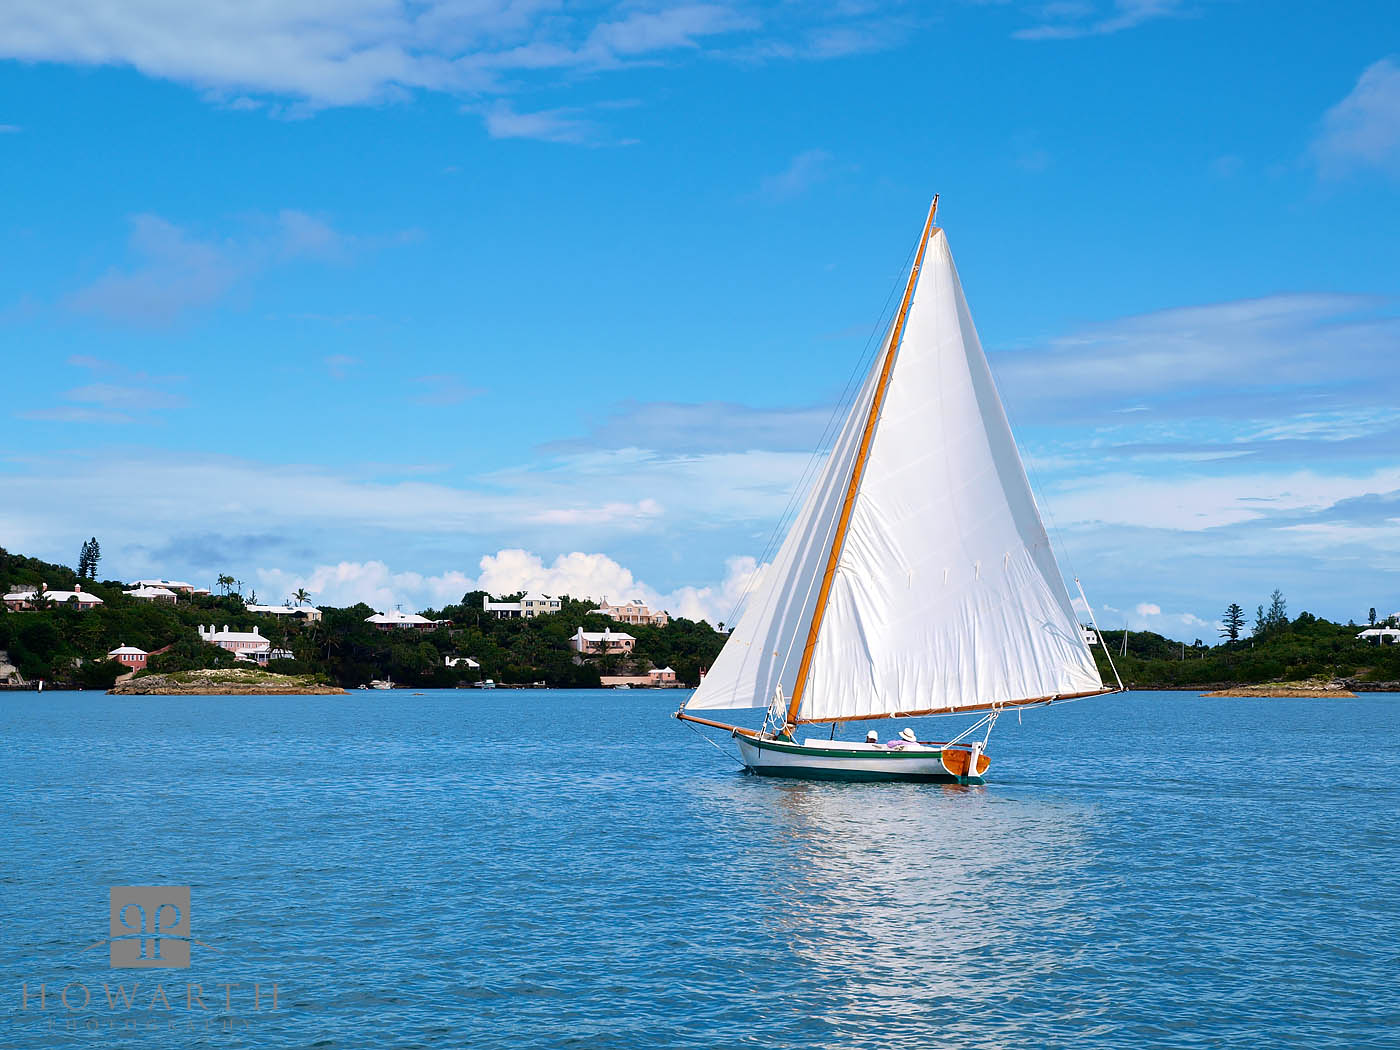 sail, relaxing, hamilton, harbour, dinghy, photo